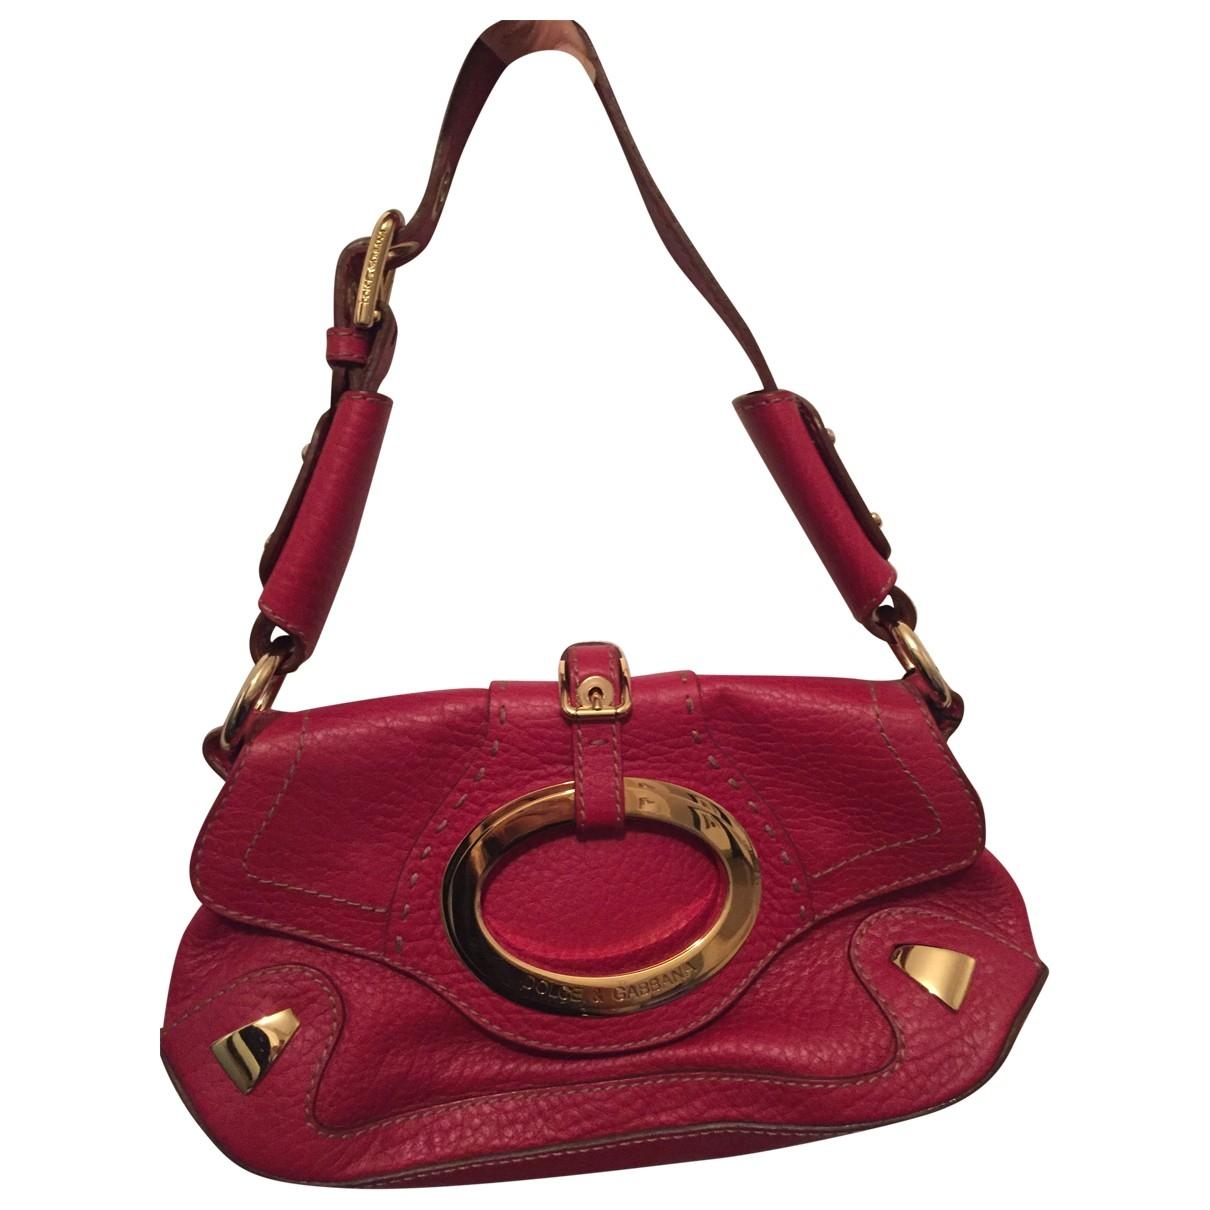 Dolce & Gabbana \N Handtasche in  Rot Leder